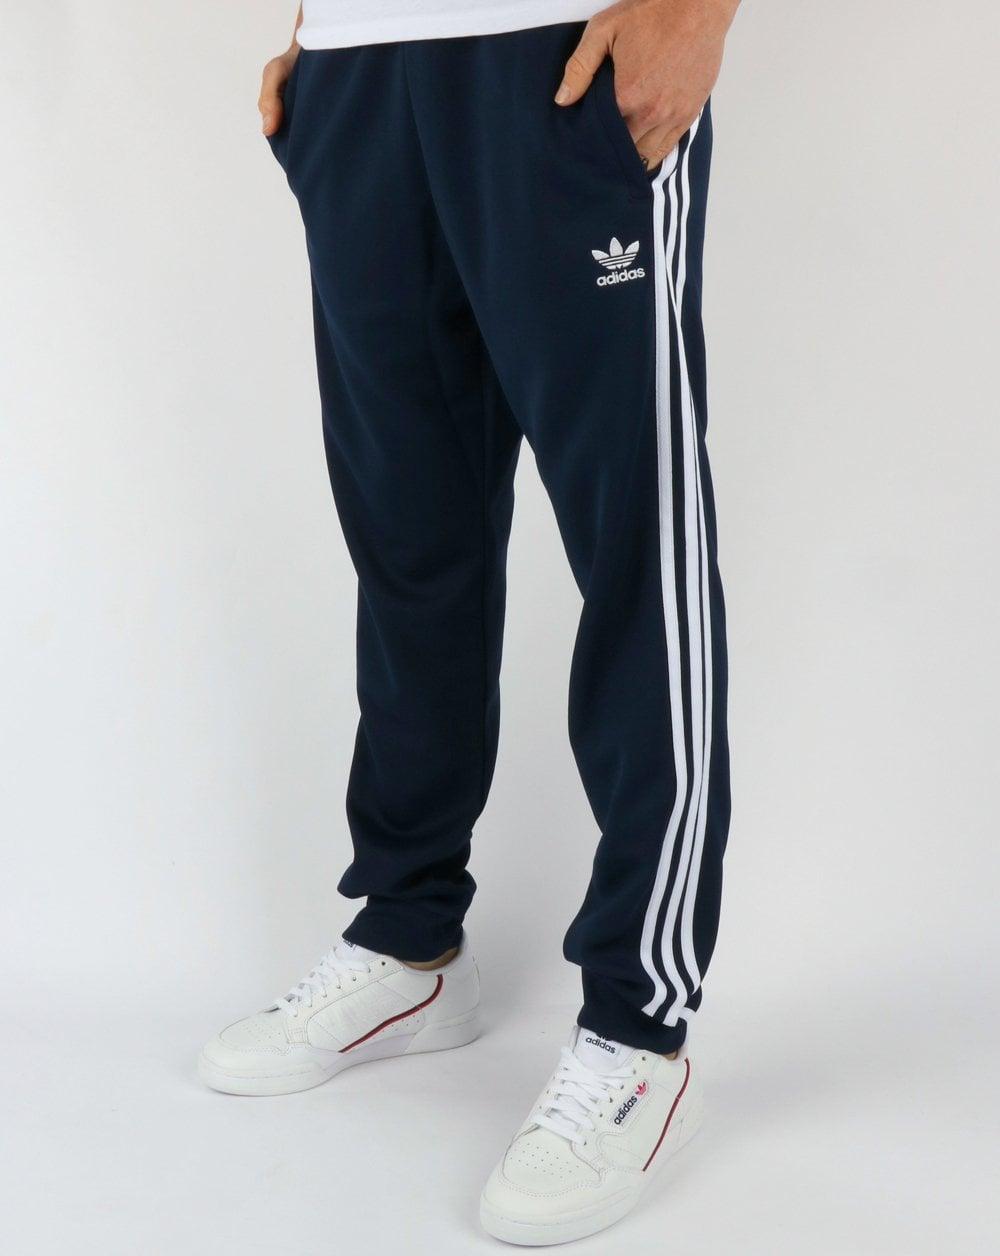 9c75ff0a1a4d adidas Originals Adidas Originals Superstar Track Pants Navy White